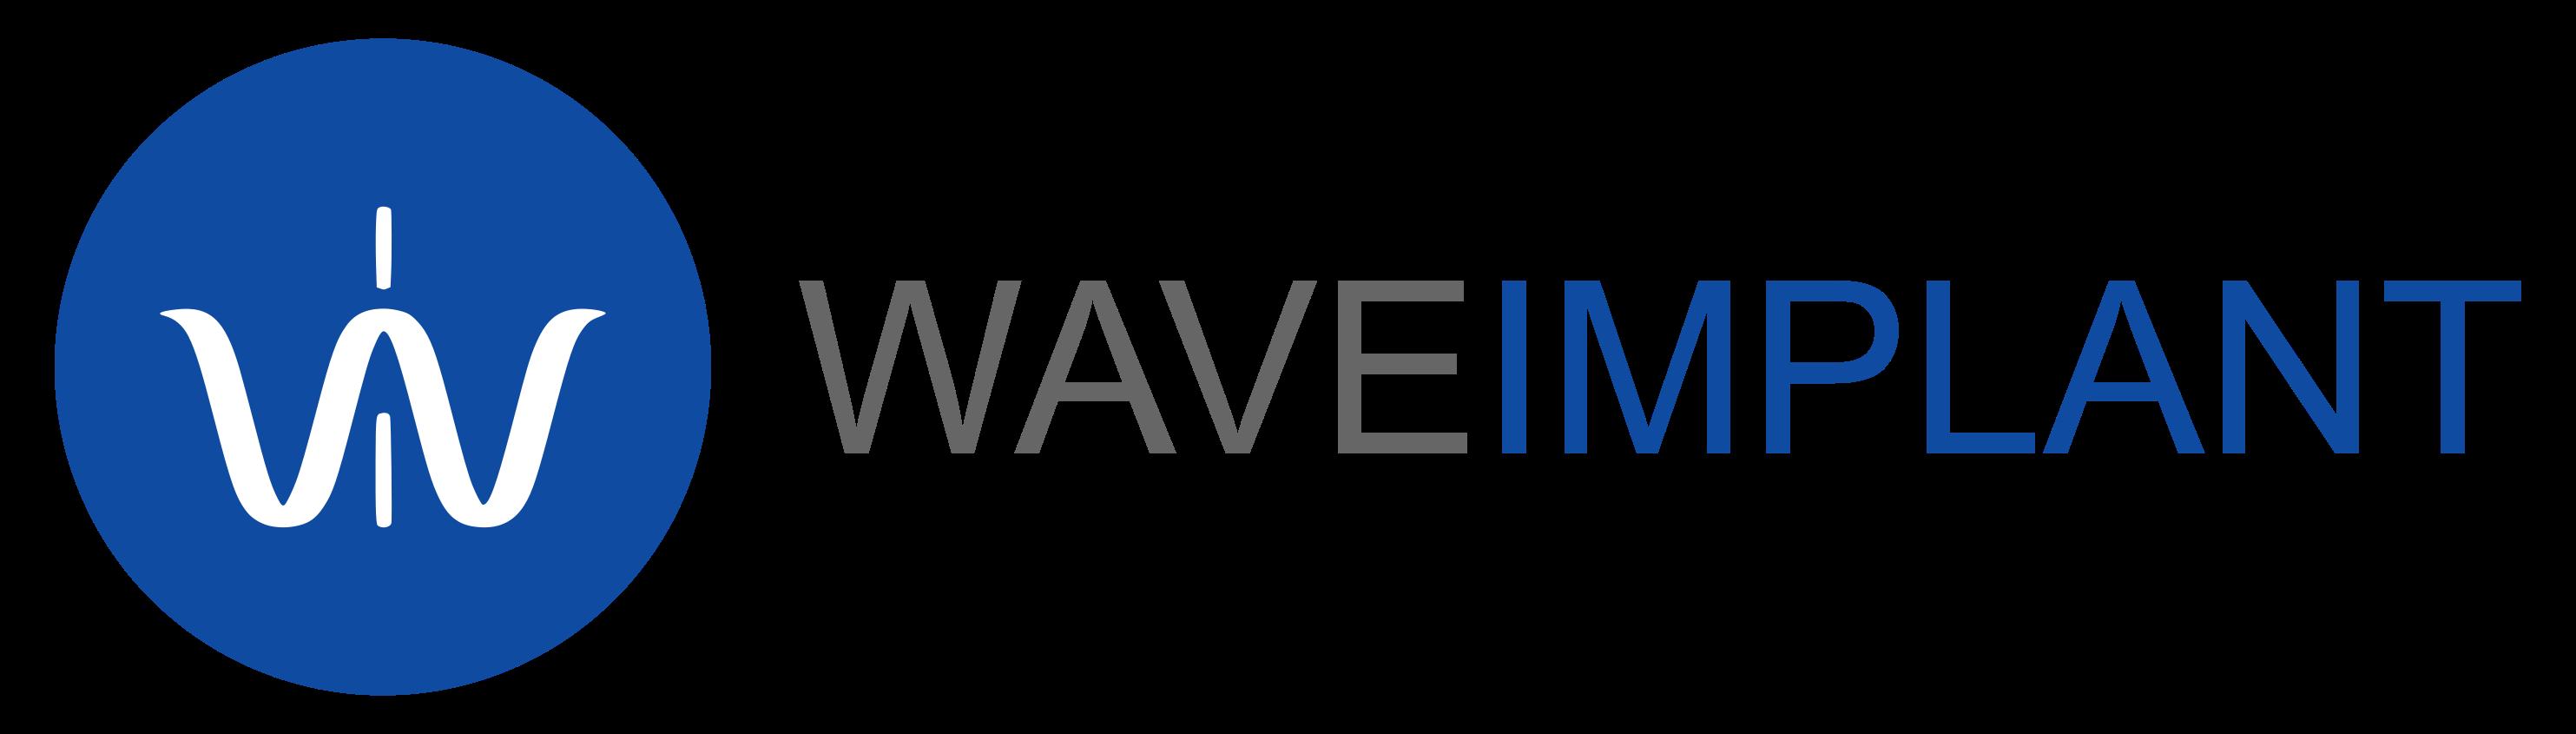 WAVE IMPLANT